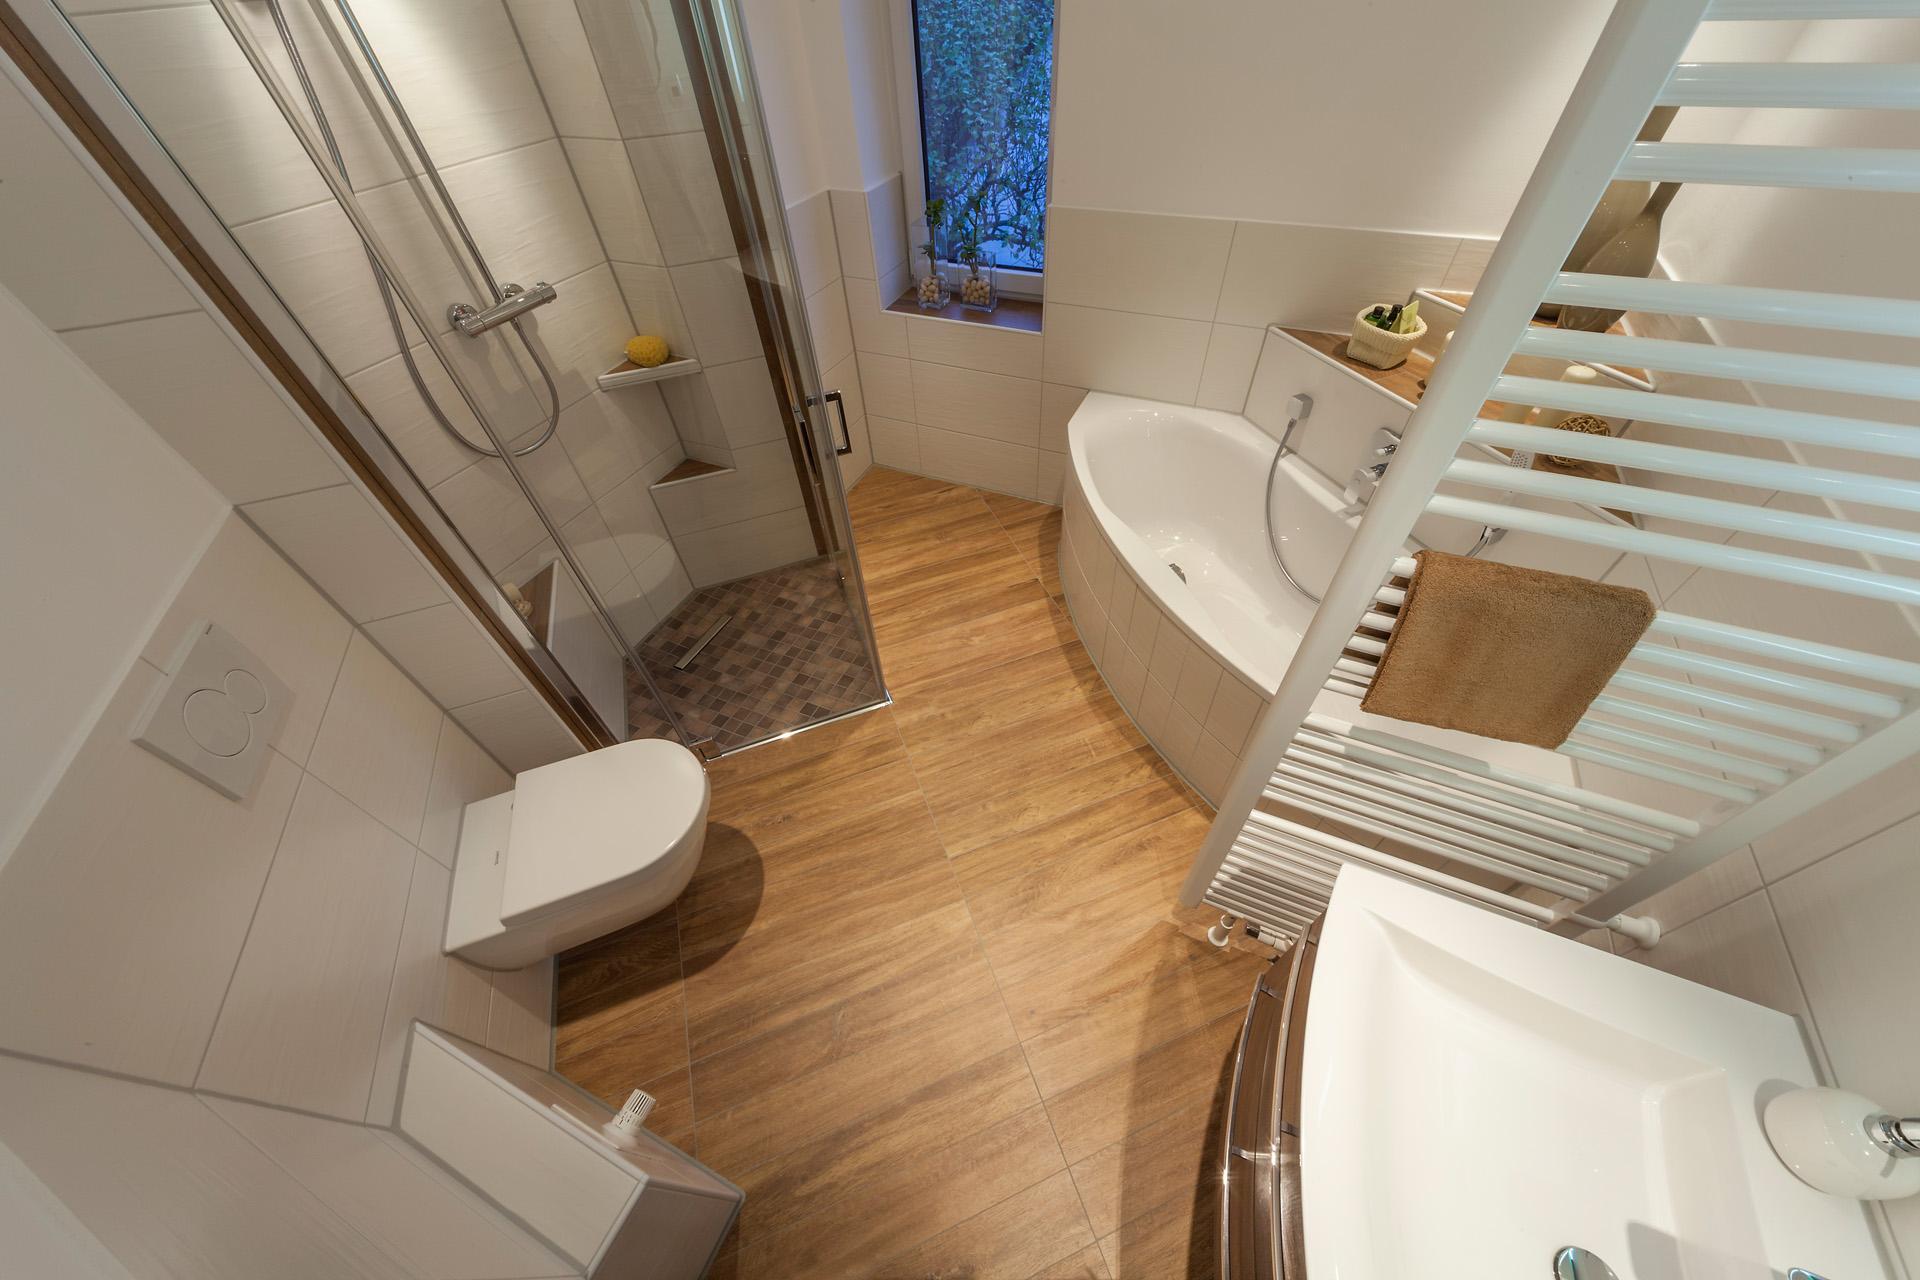 Mosaikfliesen Badezimmer • Bilder & Ideen • COUCH